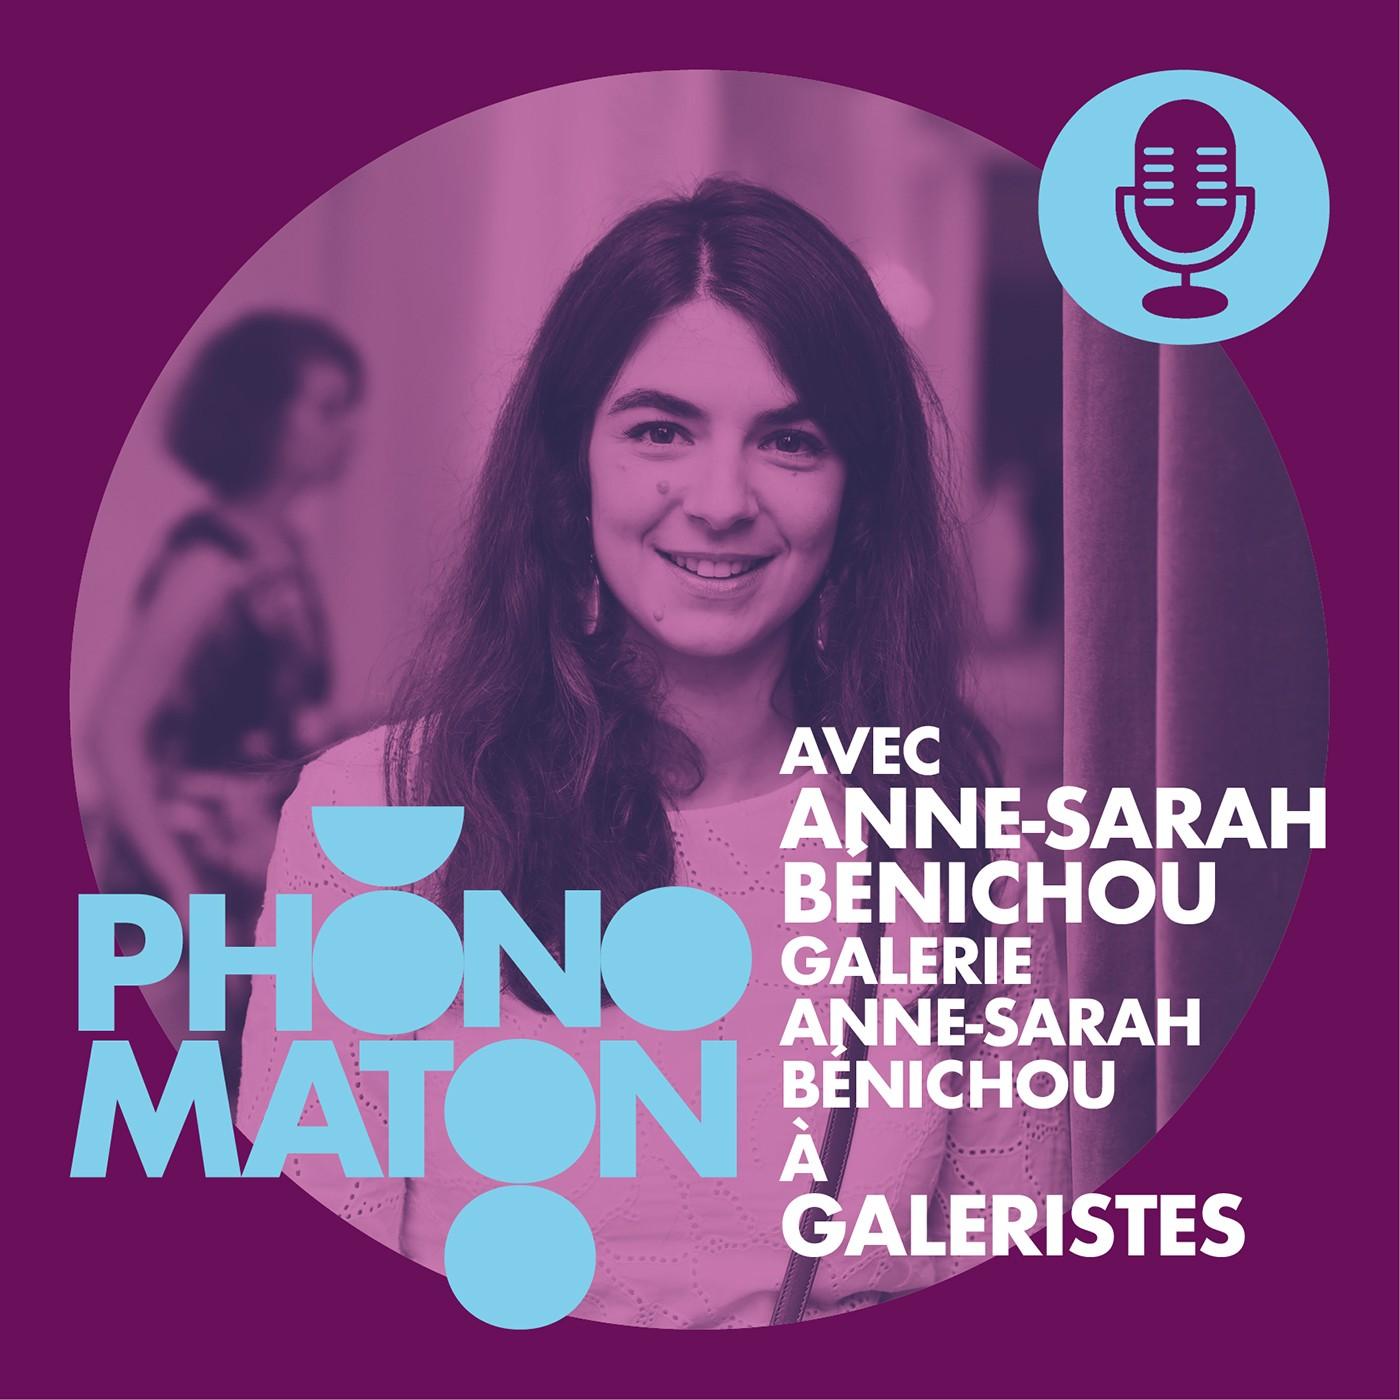 Phonomaton avec Anne-Sarah Bénichou à Galeristes